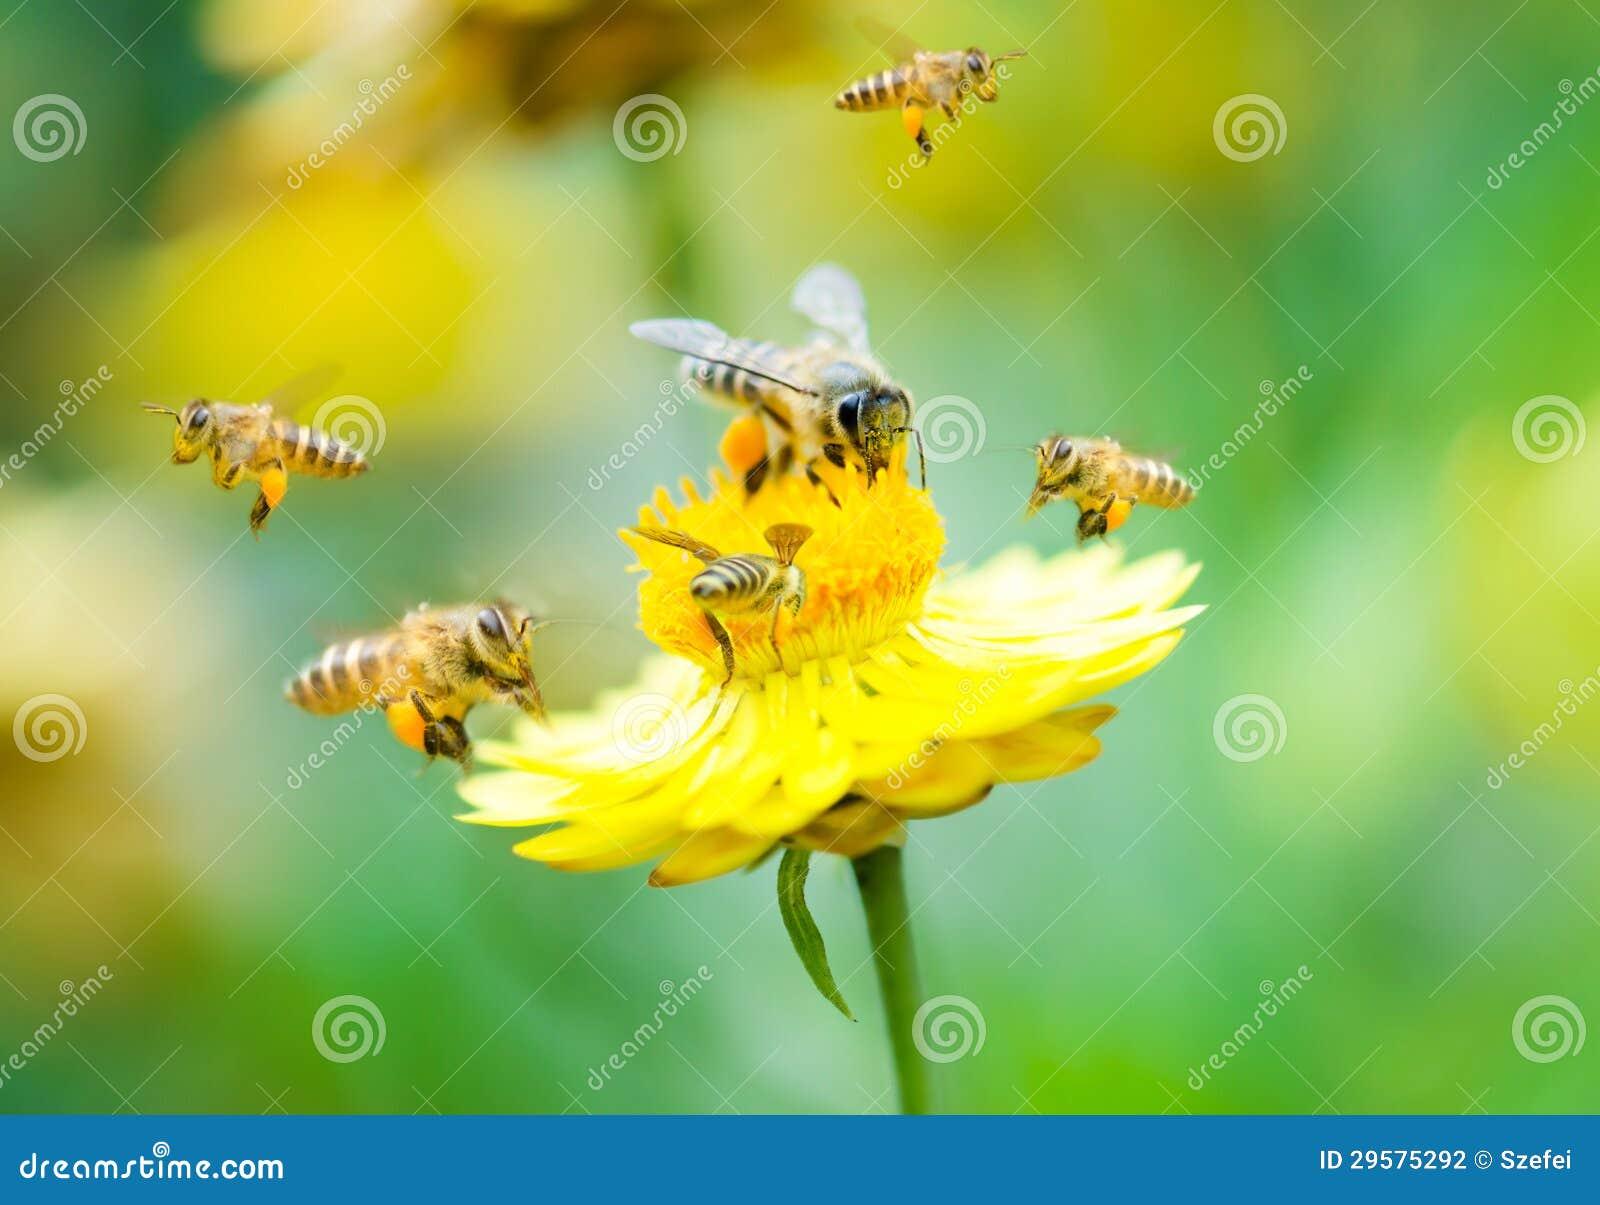 Grupo de abejas en una flor